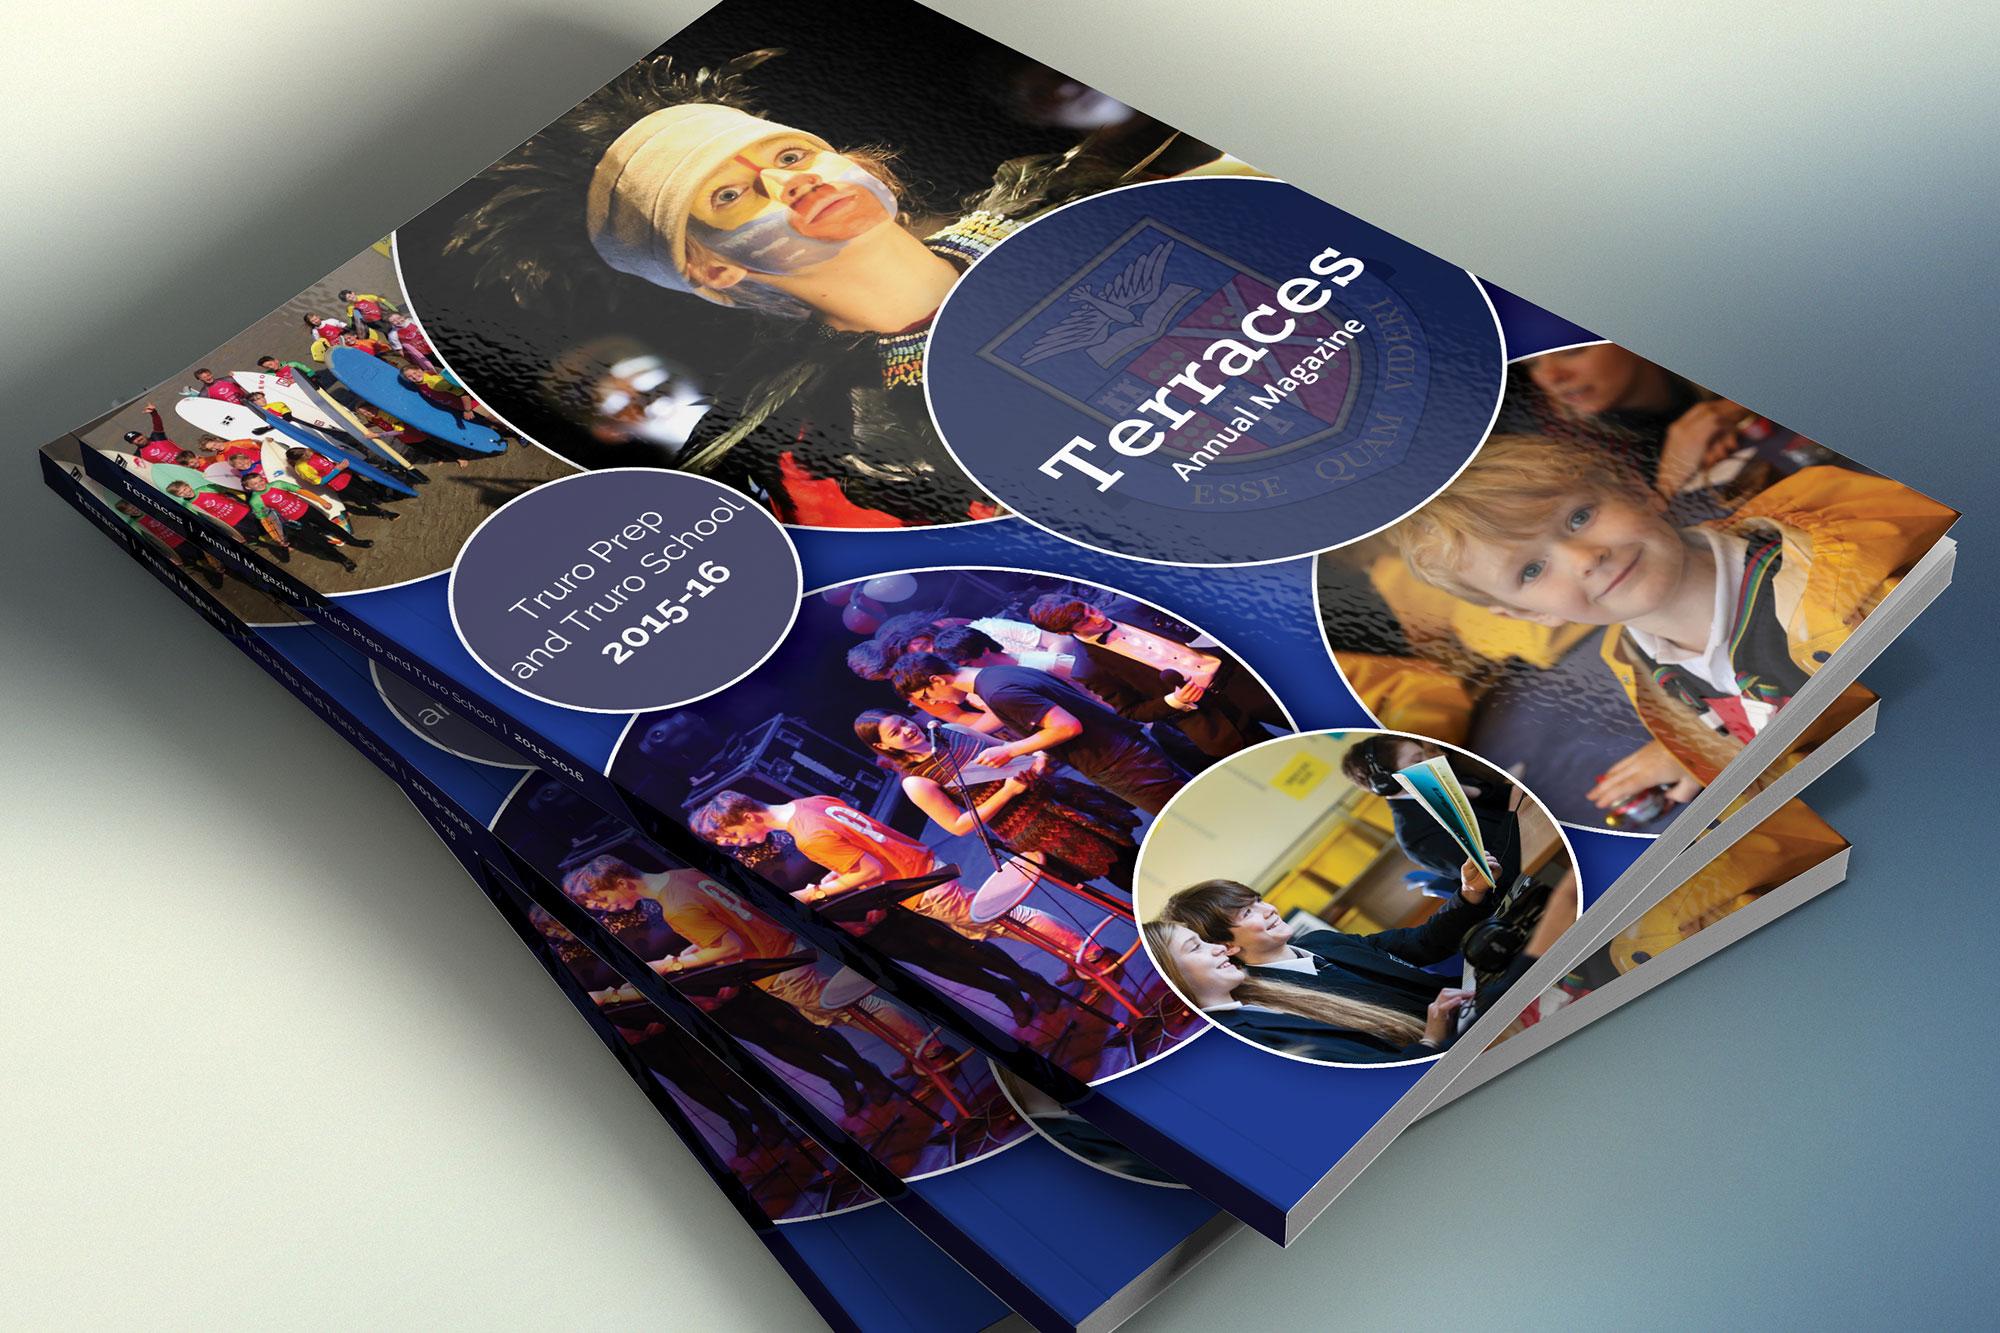 Truro School Terraces magazine